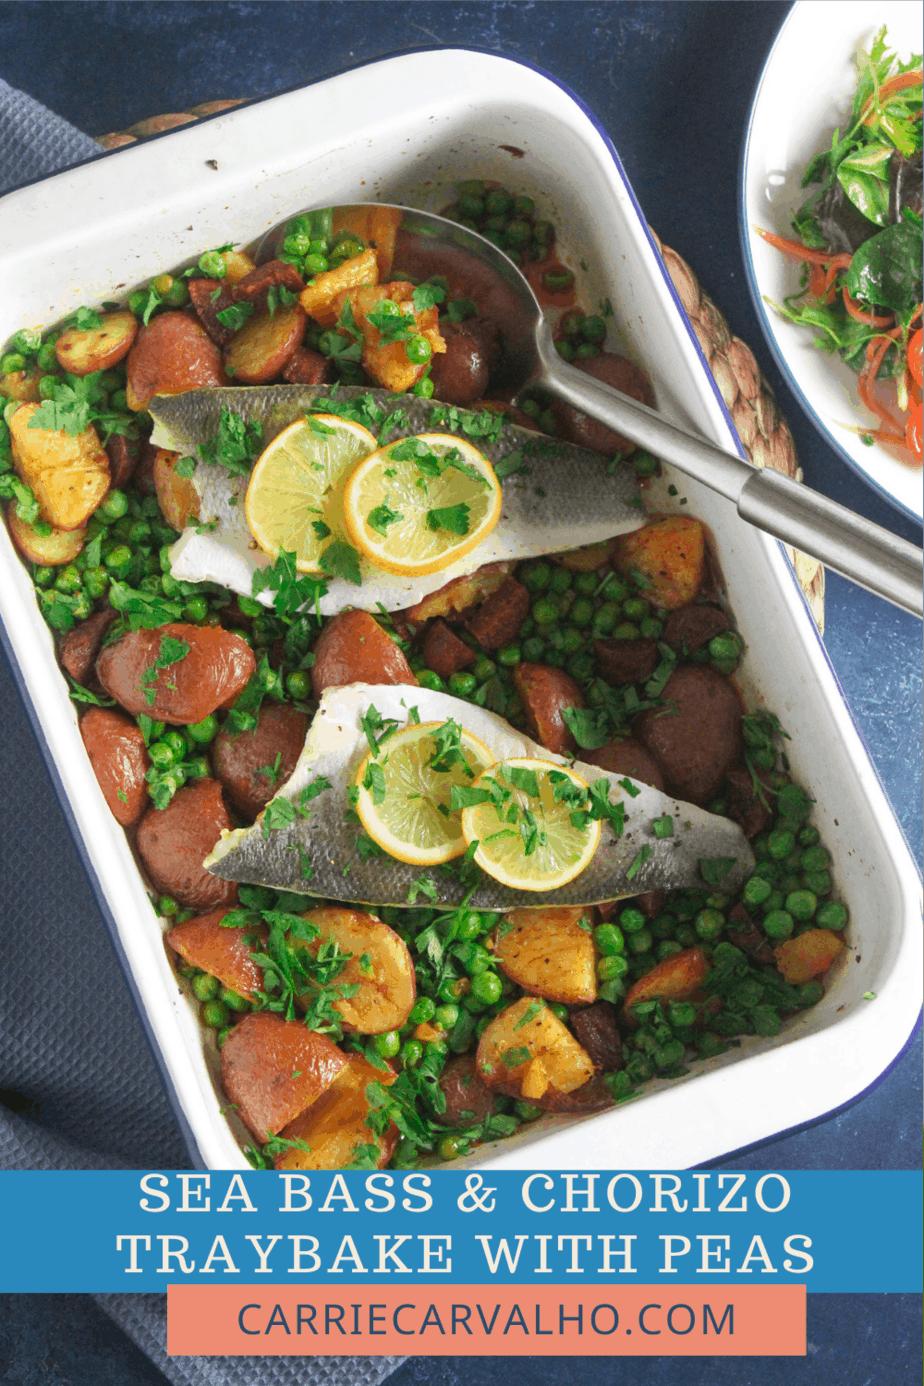 Sea Bass and Chorizo Traybake with Peas and Potato